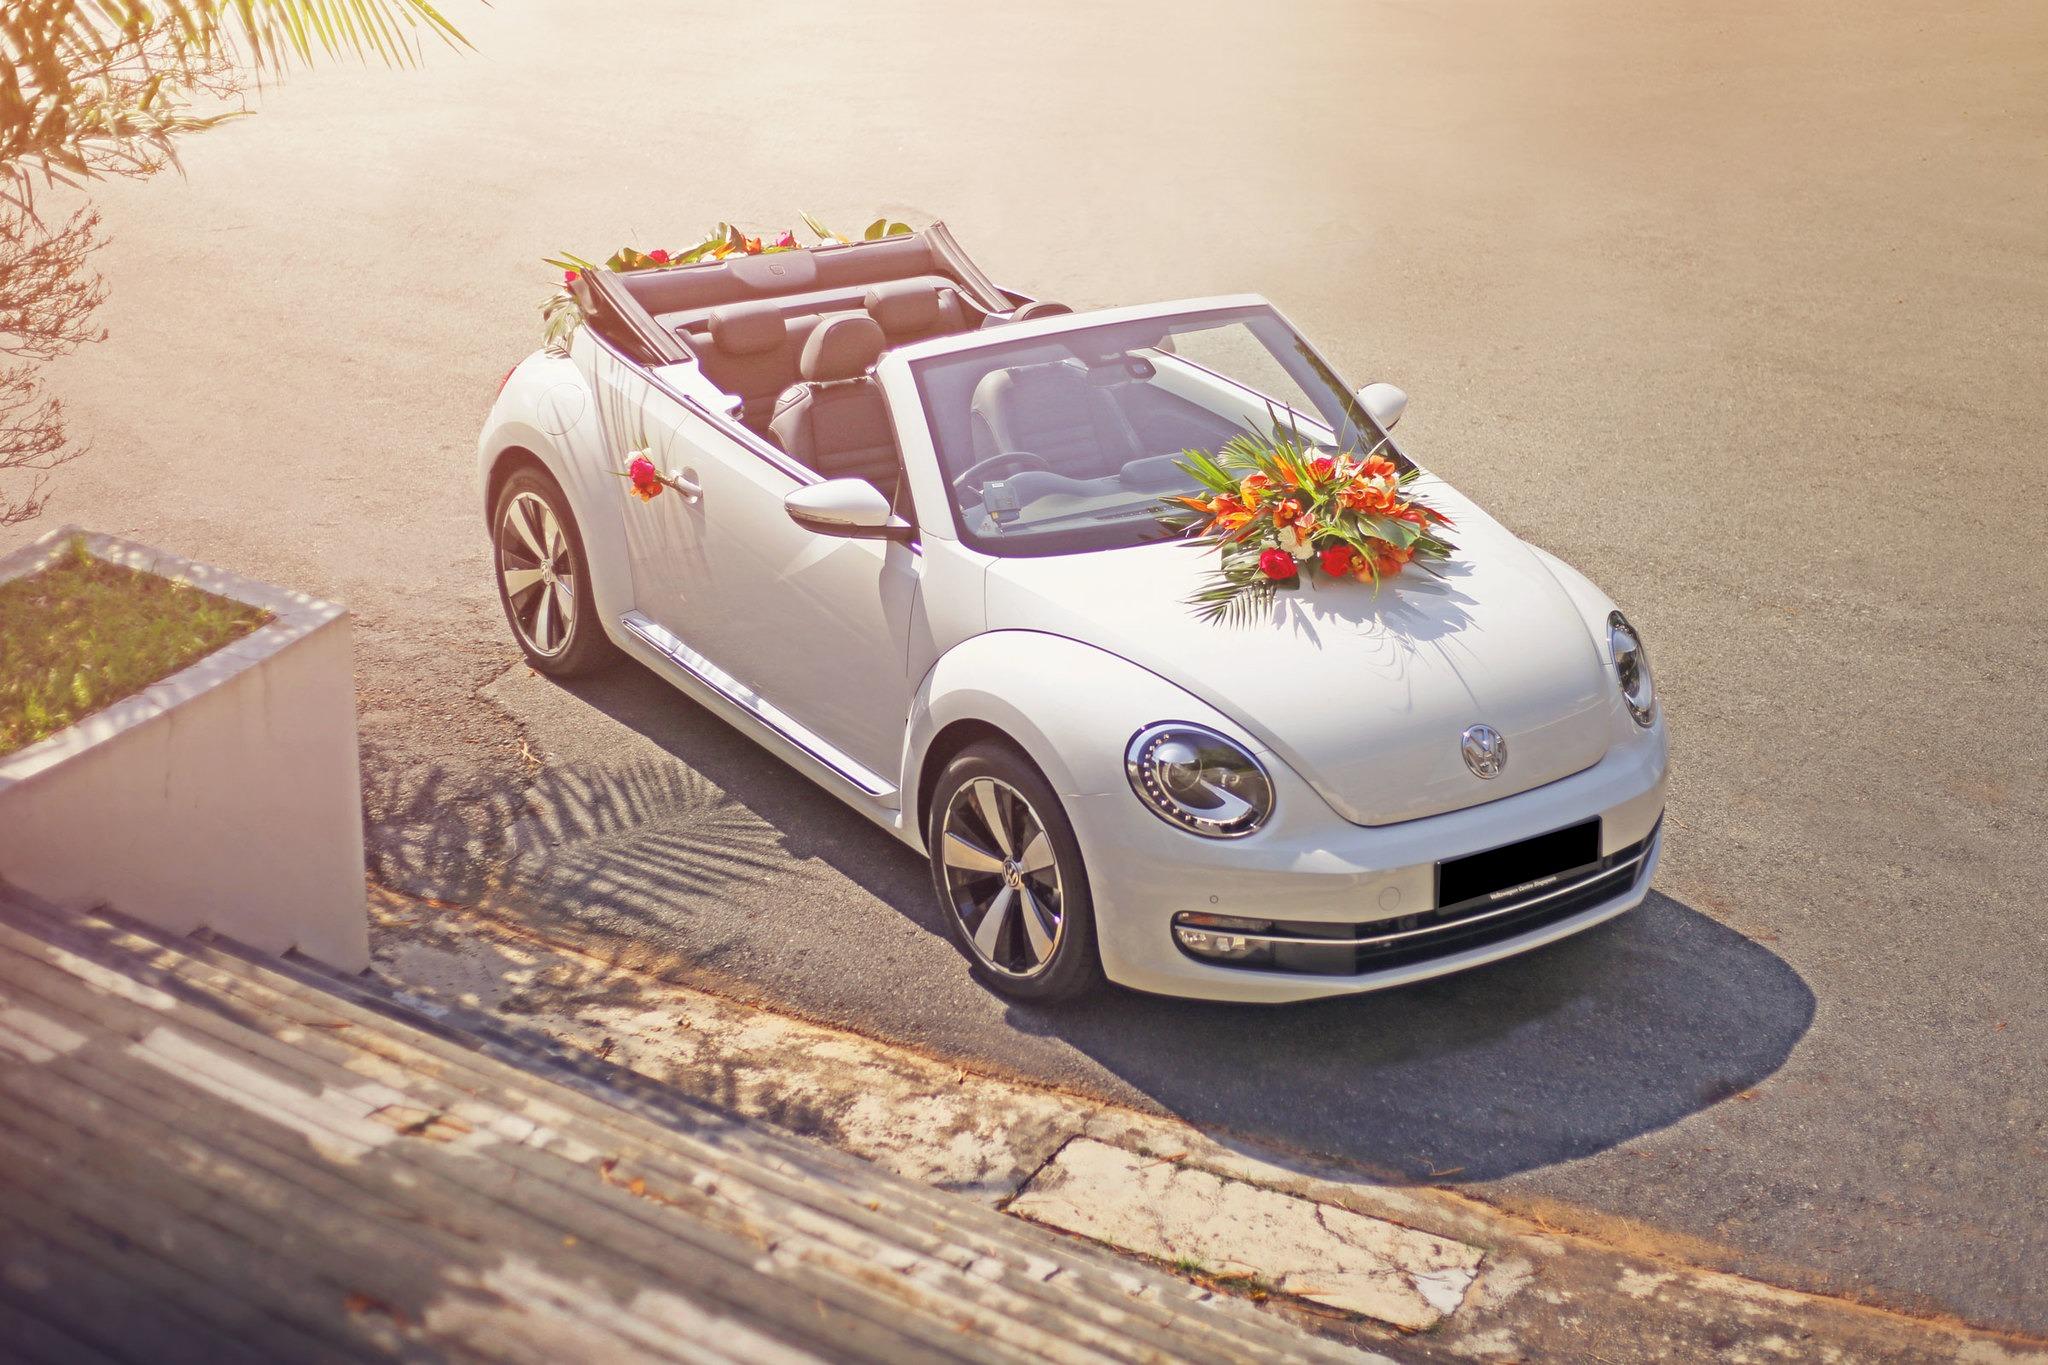 Volkswagen Beetle Cabriolet 1 2 Dsg Cars Car Rental On Carousell